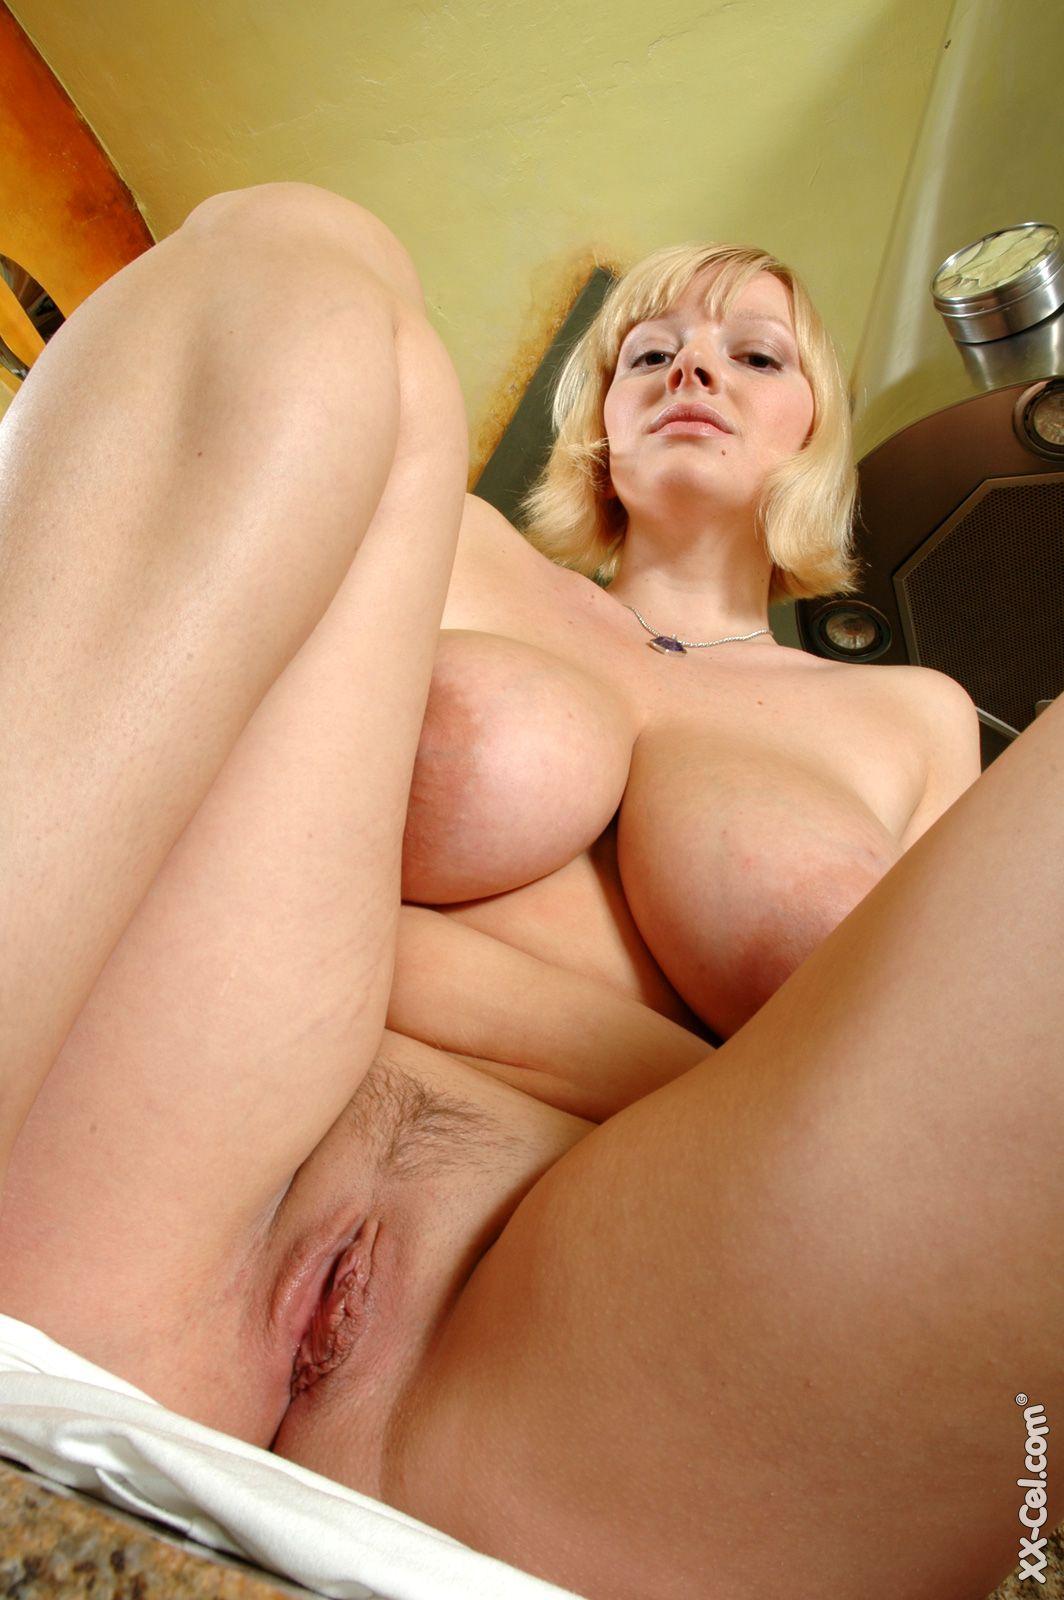 Big natural tit blonde